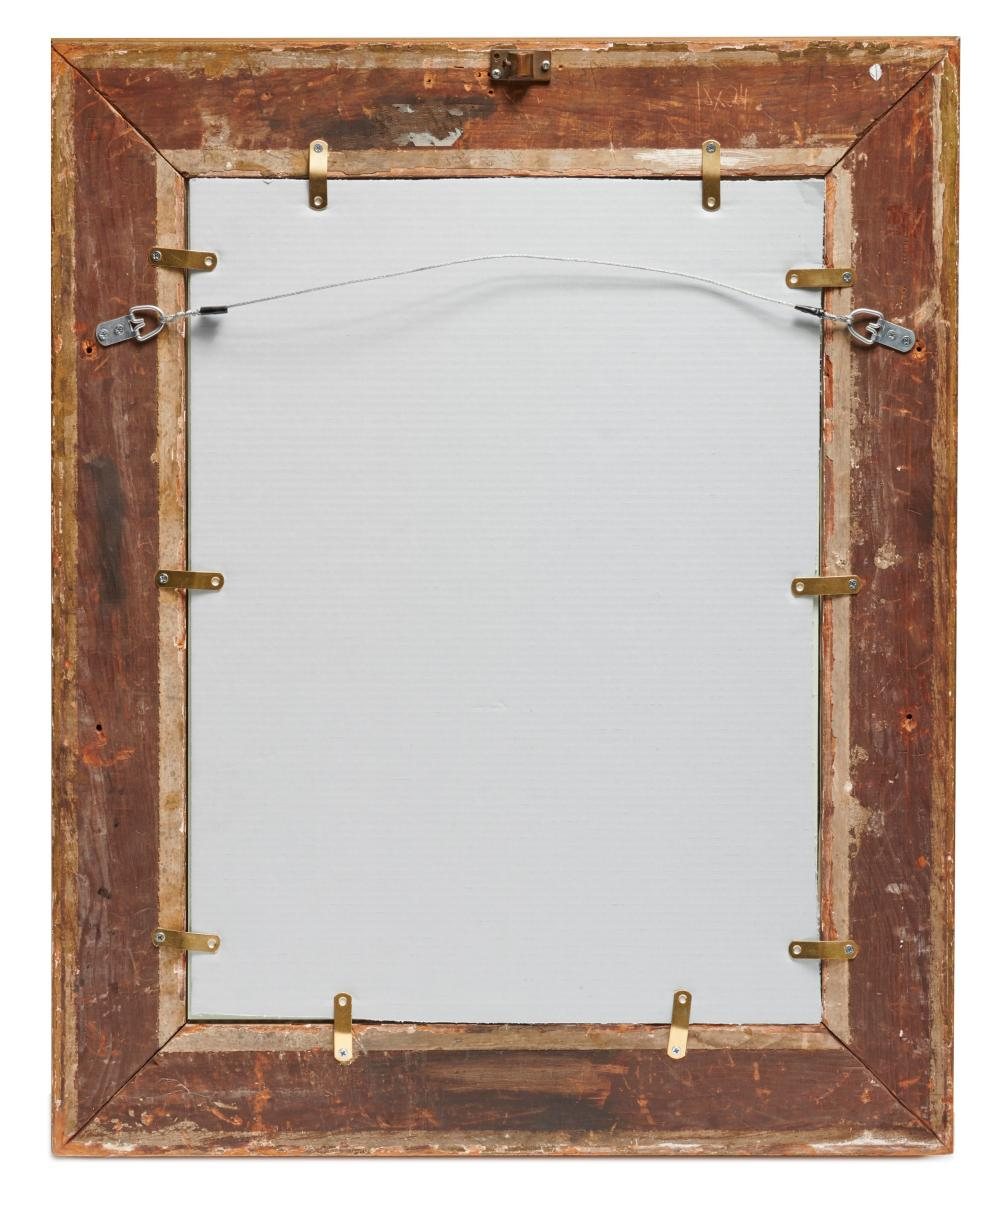 NORTON BUSH, (American, 1834-1894), Tropical Landscape, oil on board, 24 x 18 in., frame: 31 1/4 x 26 1/4 in.